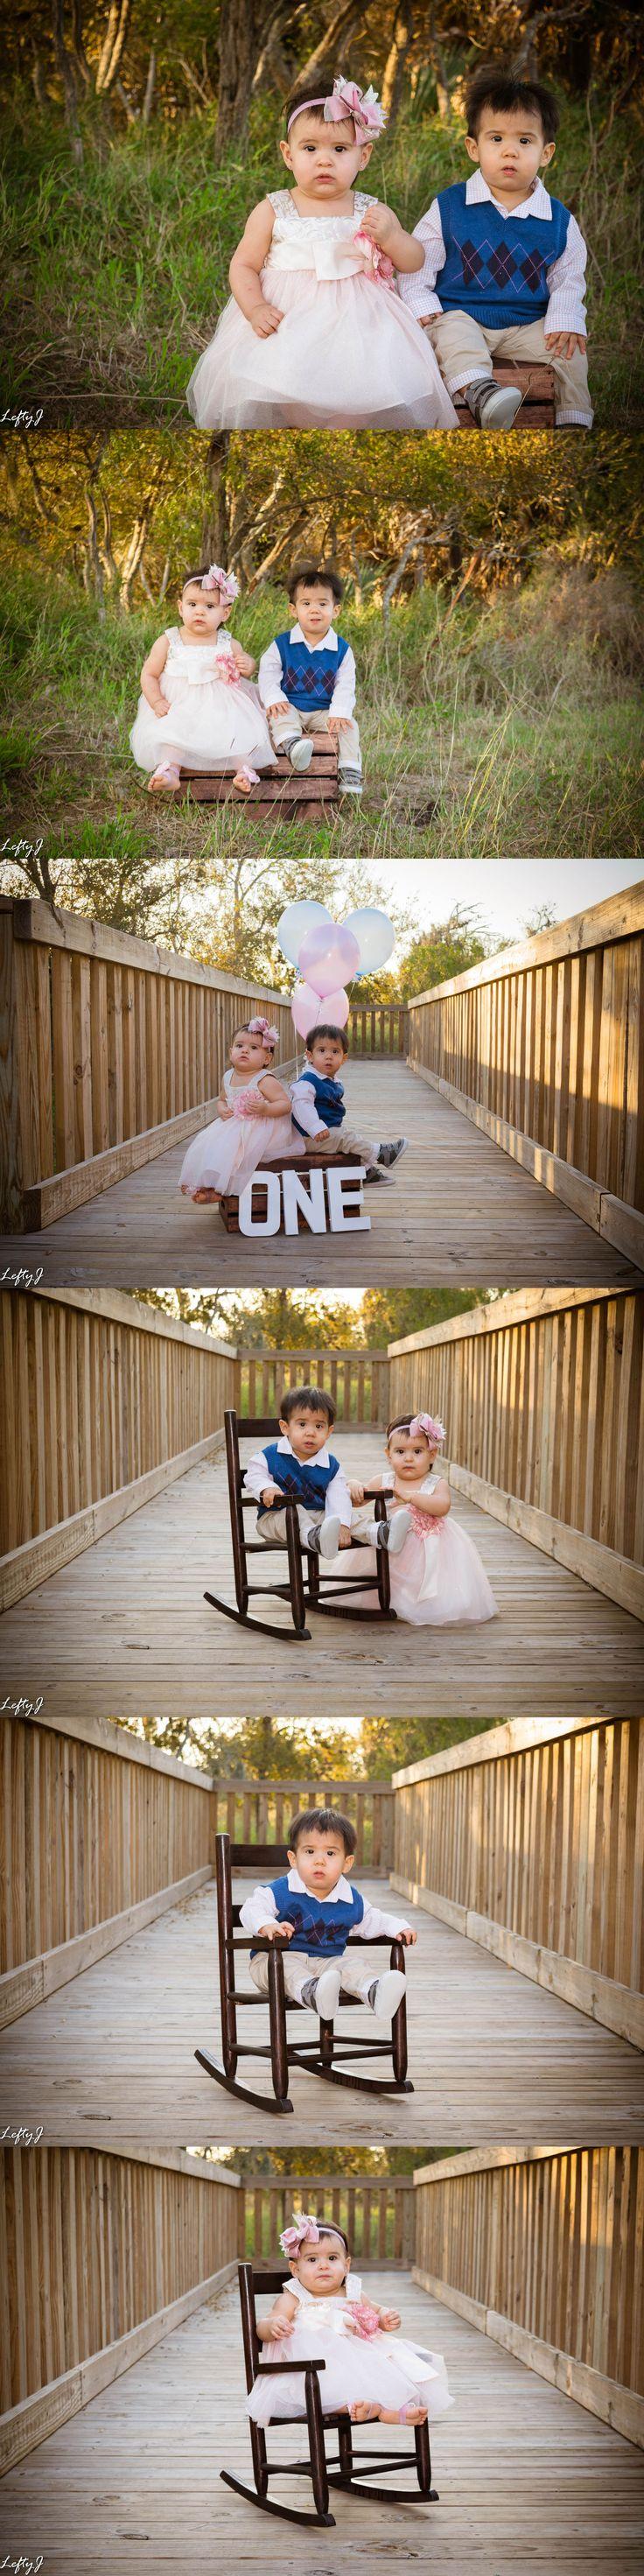 Paredez twins 1 year old photoshoot #corpuschristiphotography #corpuschristiphotographer #babyphotography #babyphotos #oneyearold #twins